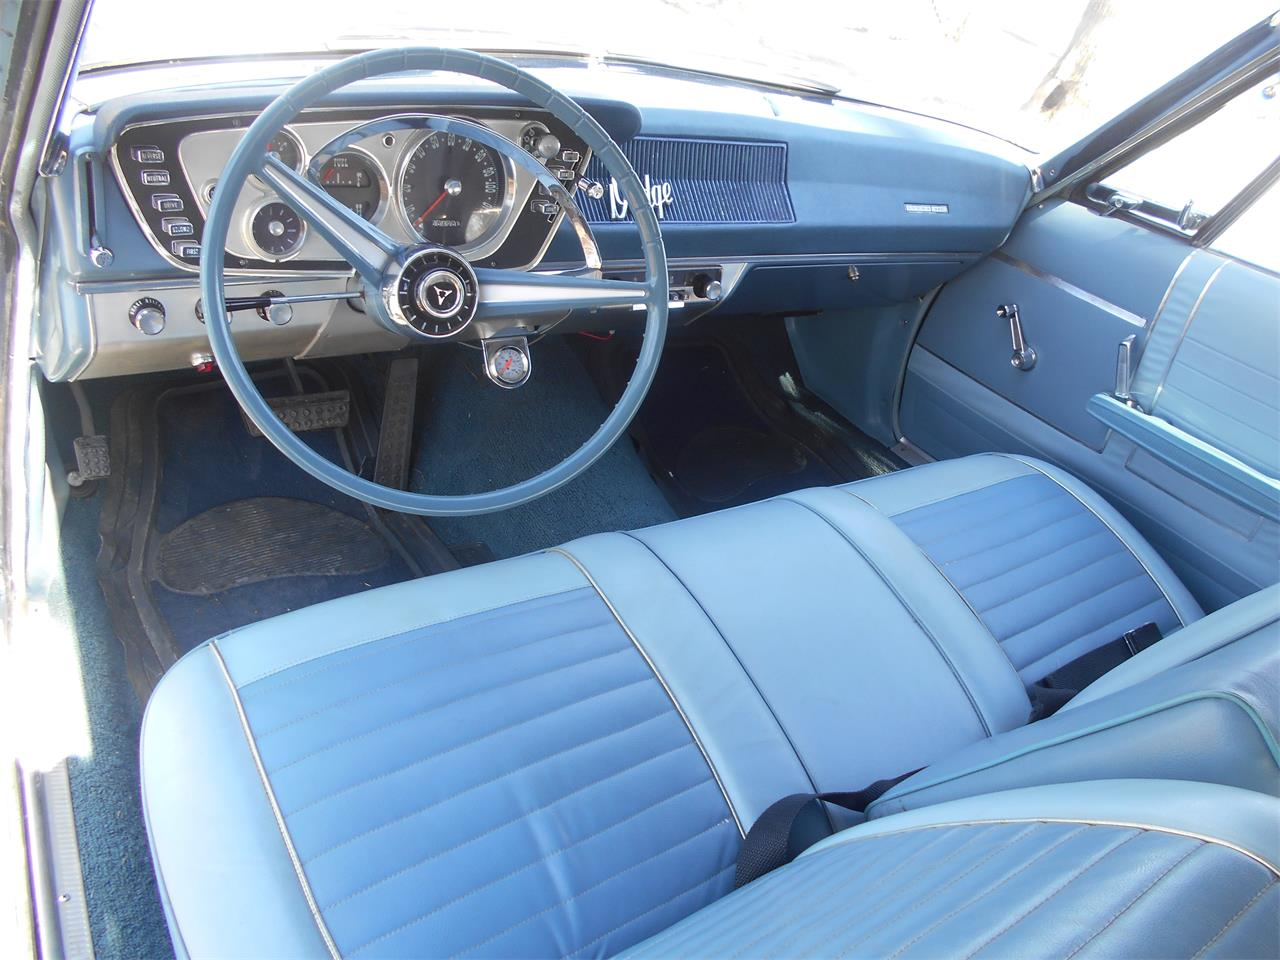 Large Picture of Classic '63 Dodge Polara located in Oakville Ontario - $19,995.00 - N7NQ